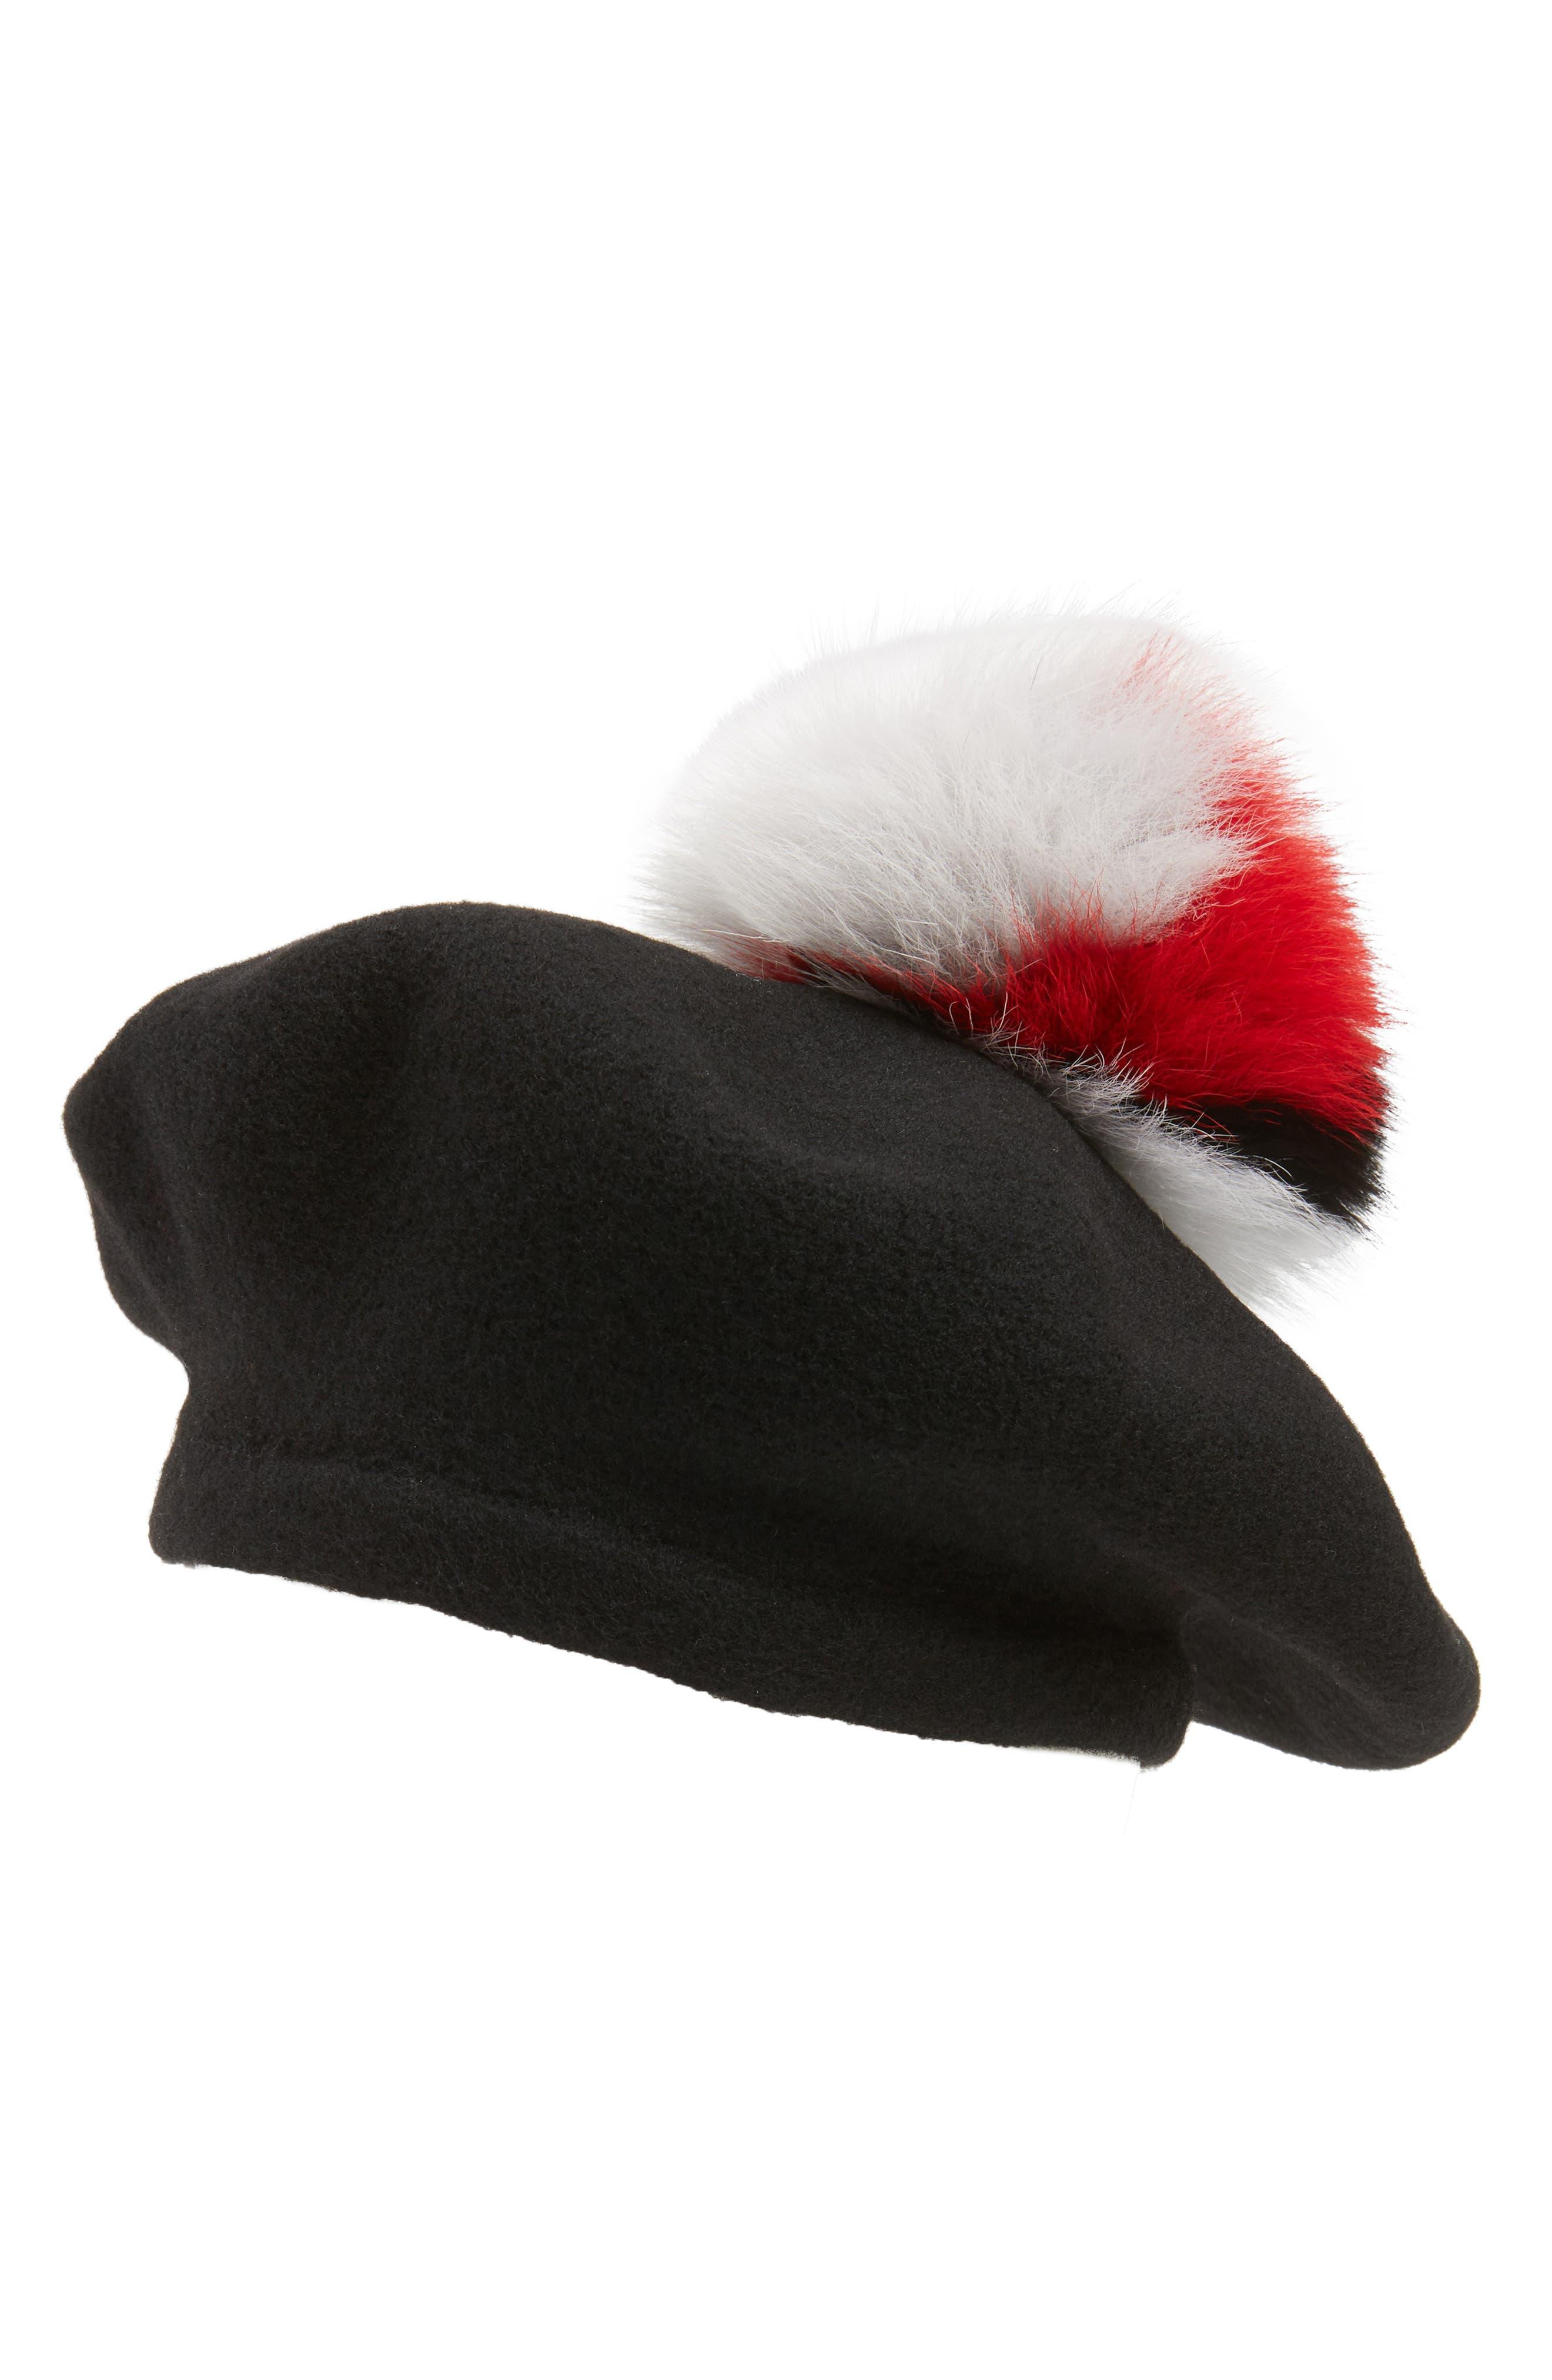 Helene Berman Wool Beret with Genuine Fox Fur Pom